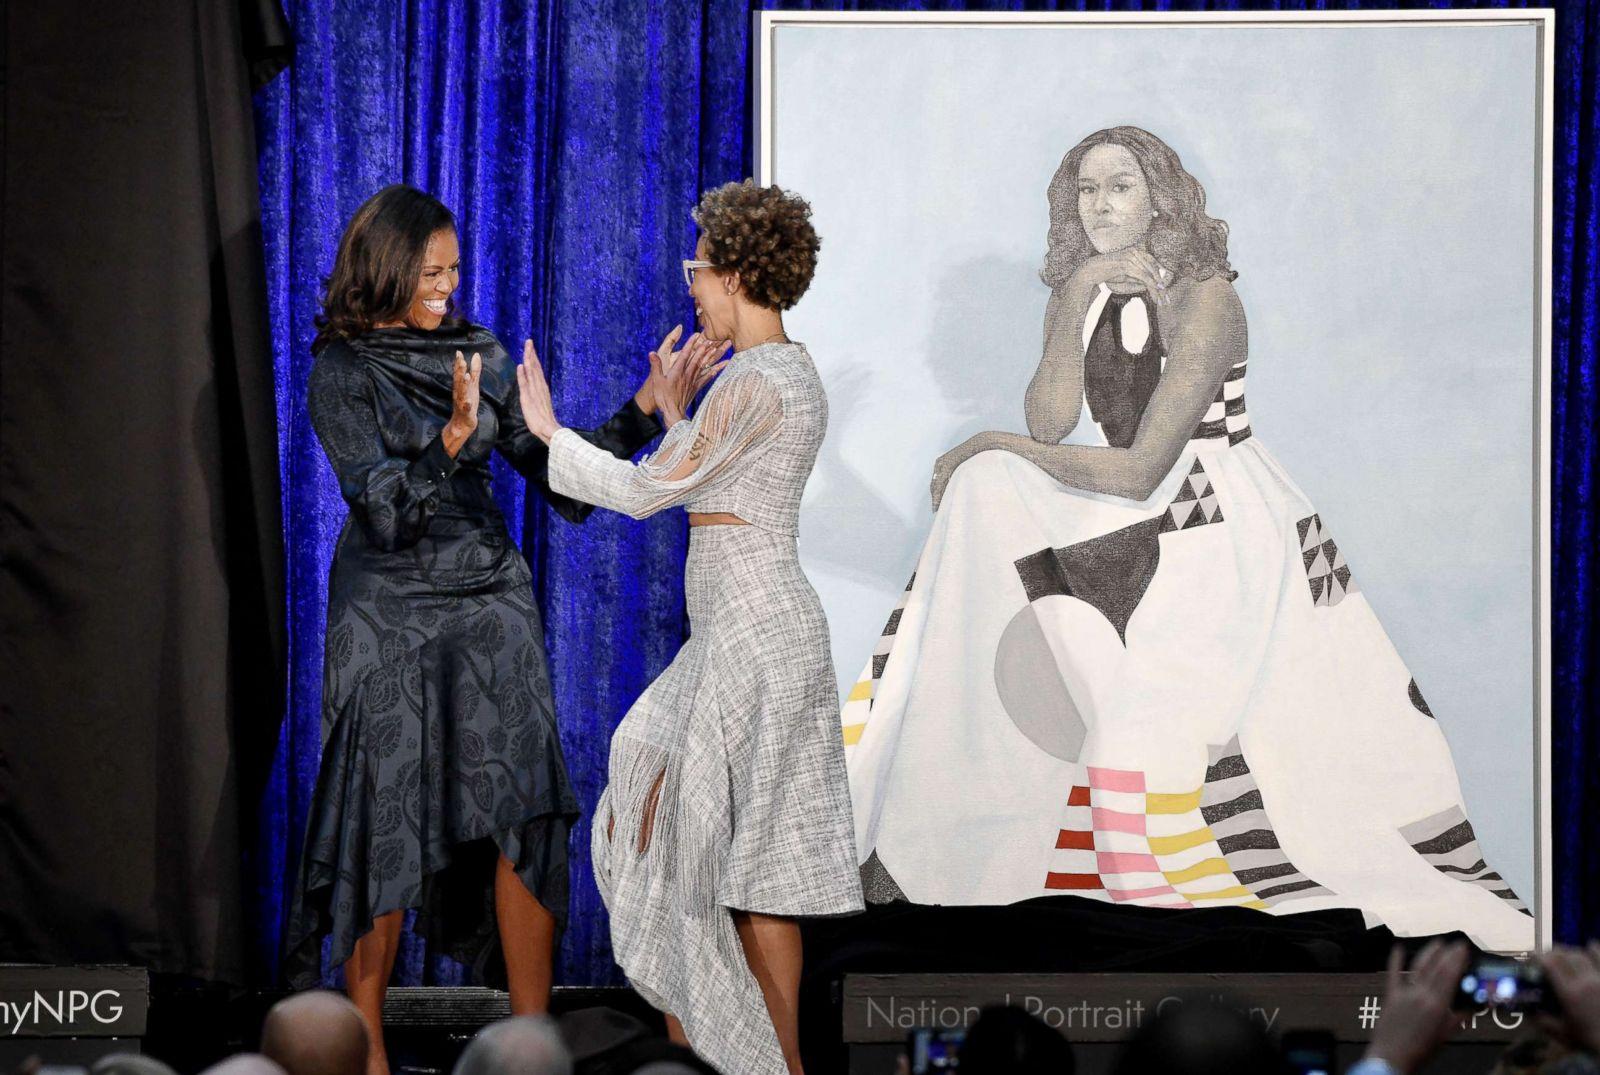 Michelle Obama through the years Photos - ABC News